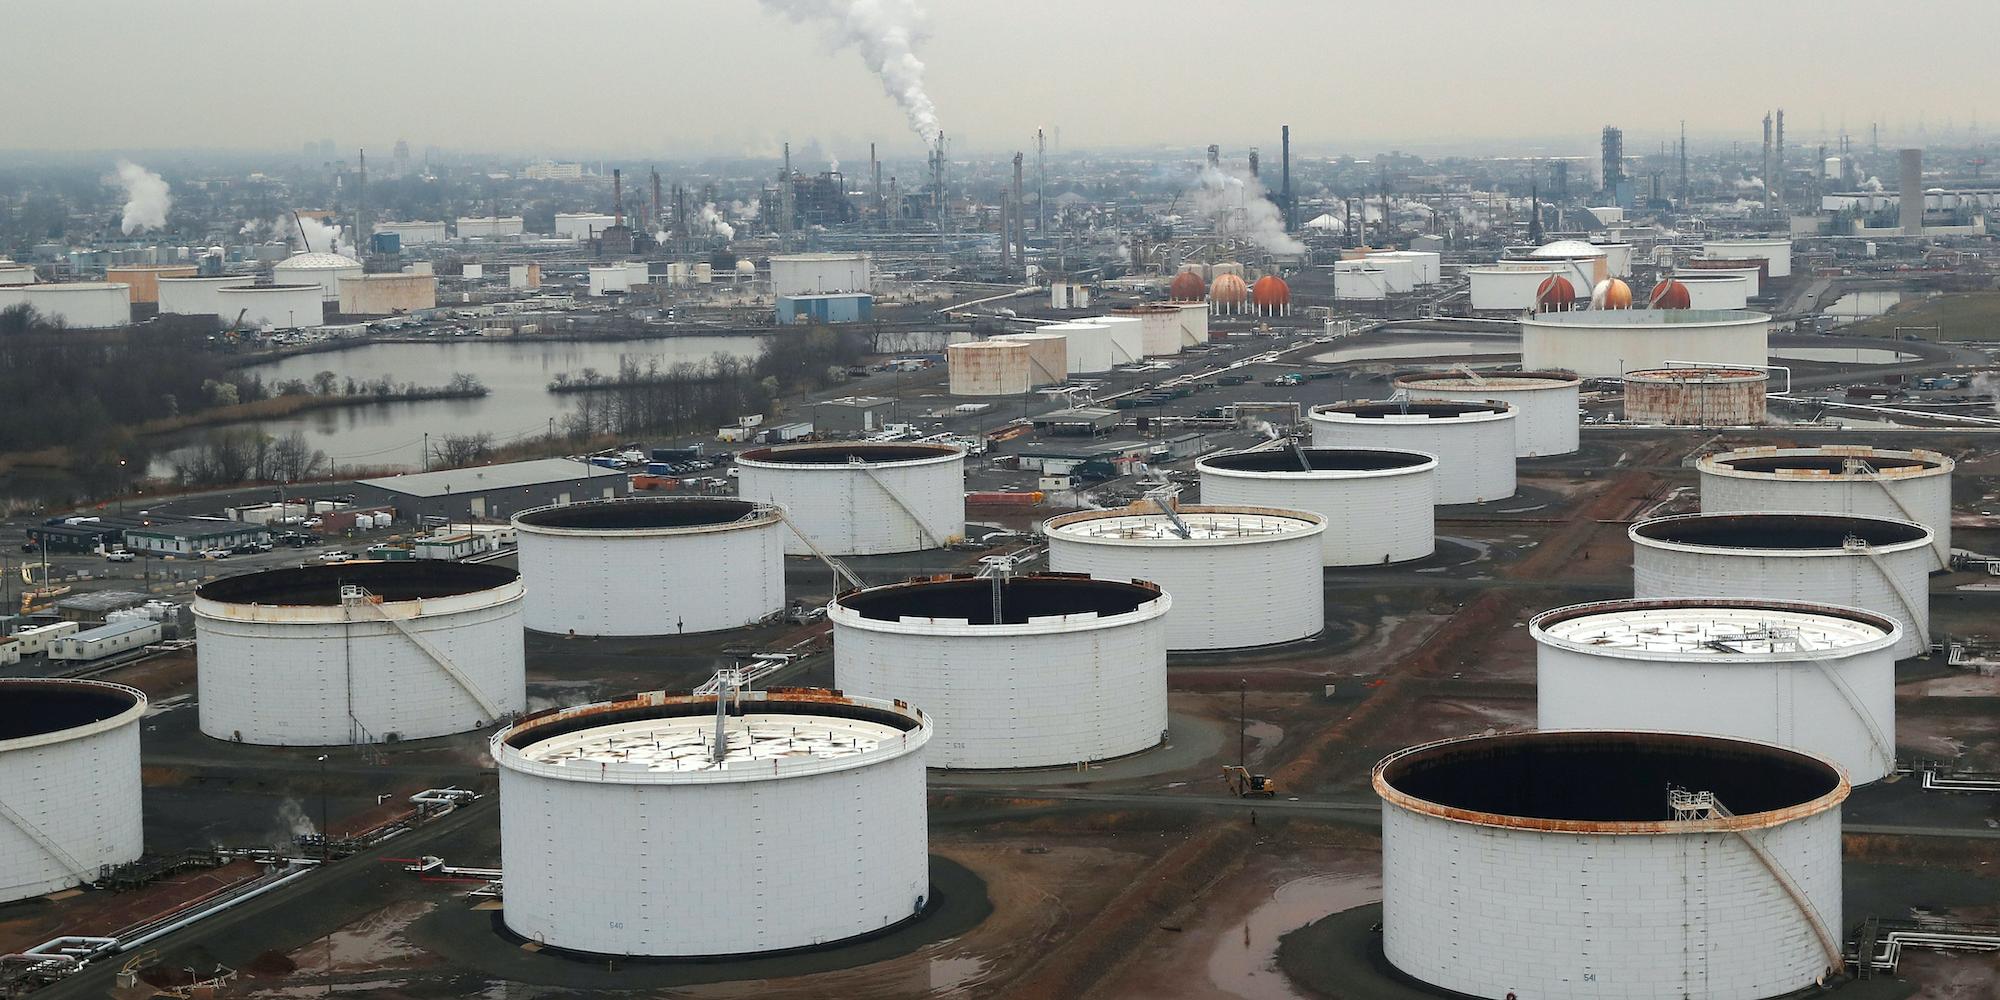 oil mid goldman sachs market